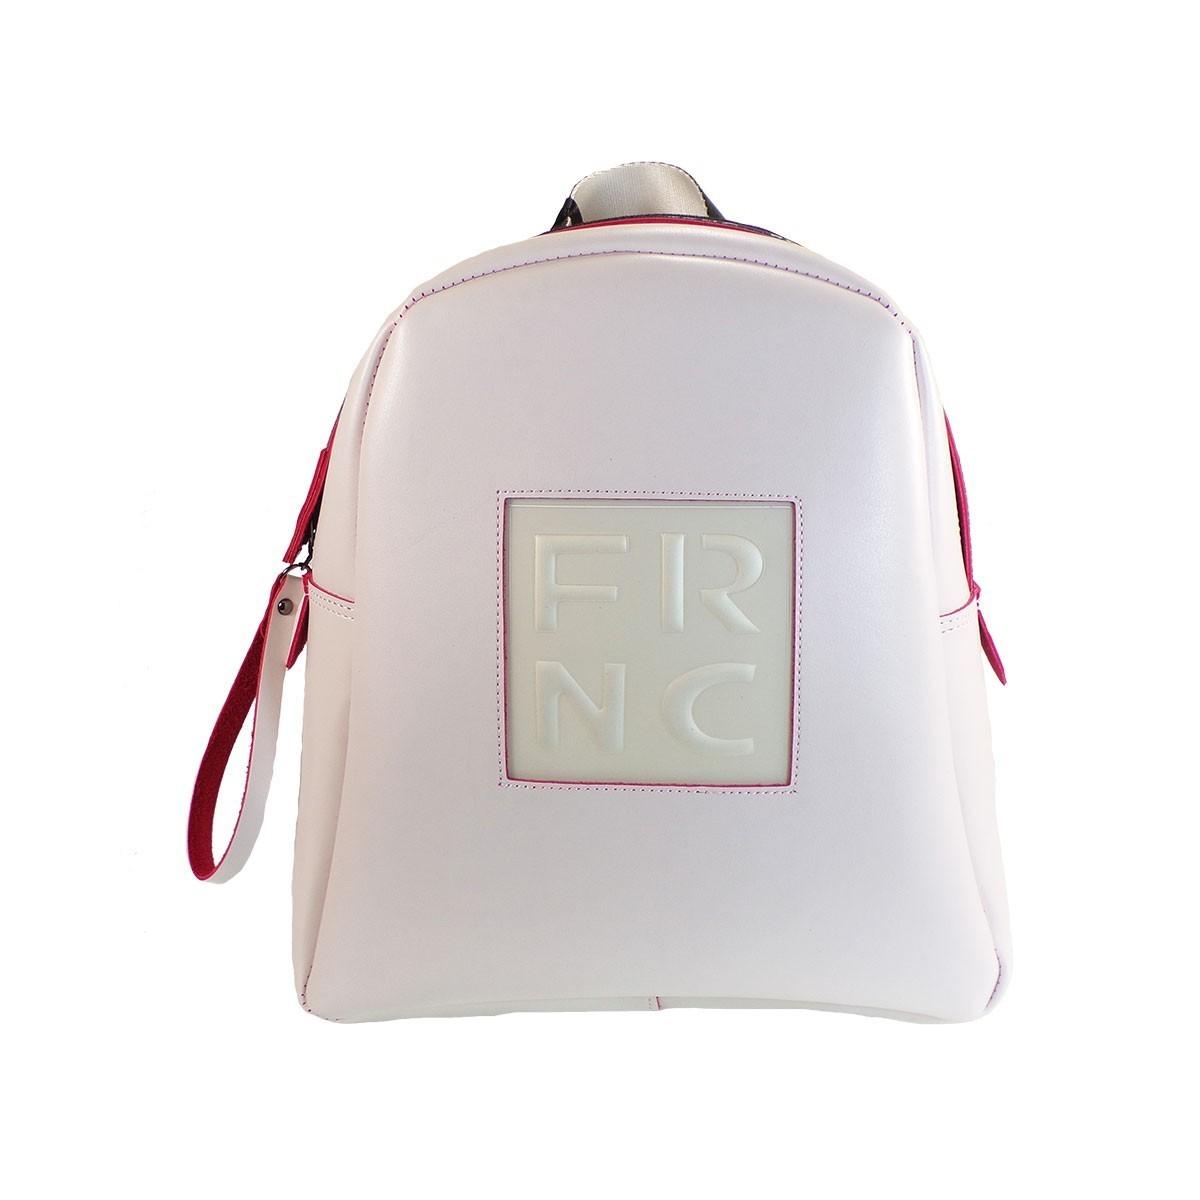 7bb15cc62f FRNC FRANCESCO Τσάντα Γυναικεία Πλάτης-Backpack 1202 Οff White Δέρμα ...